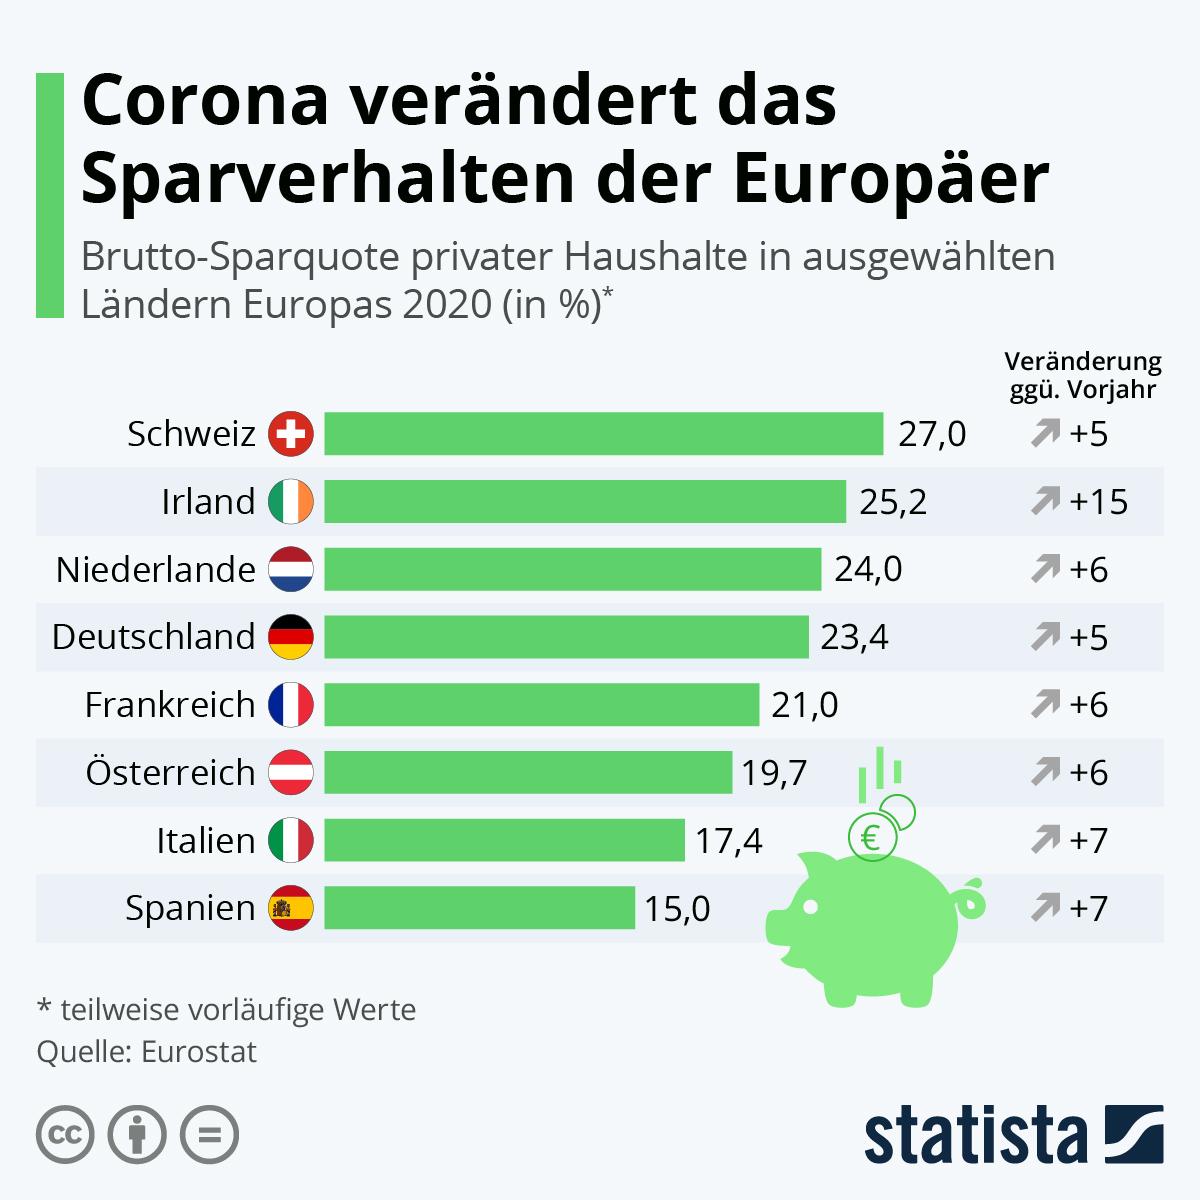 Infografik: Corona verändert das Sparverhalten der Europäer | Statista